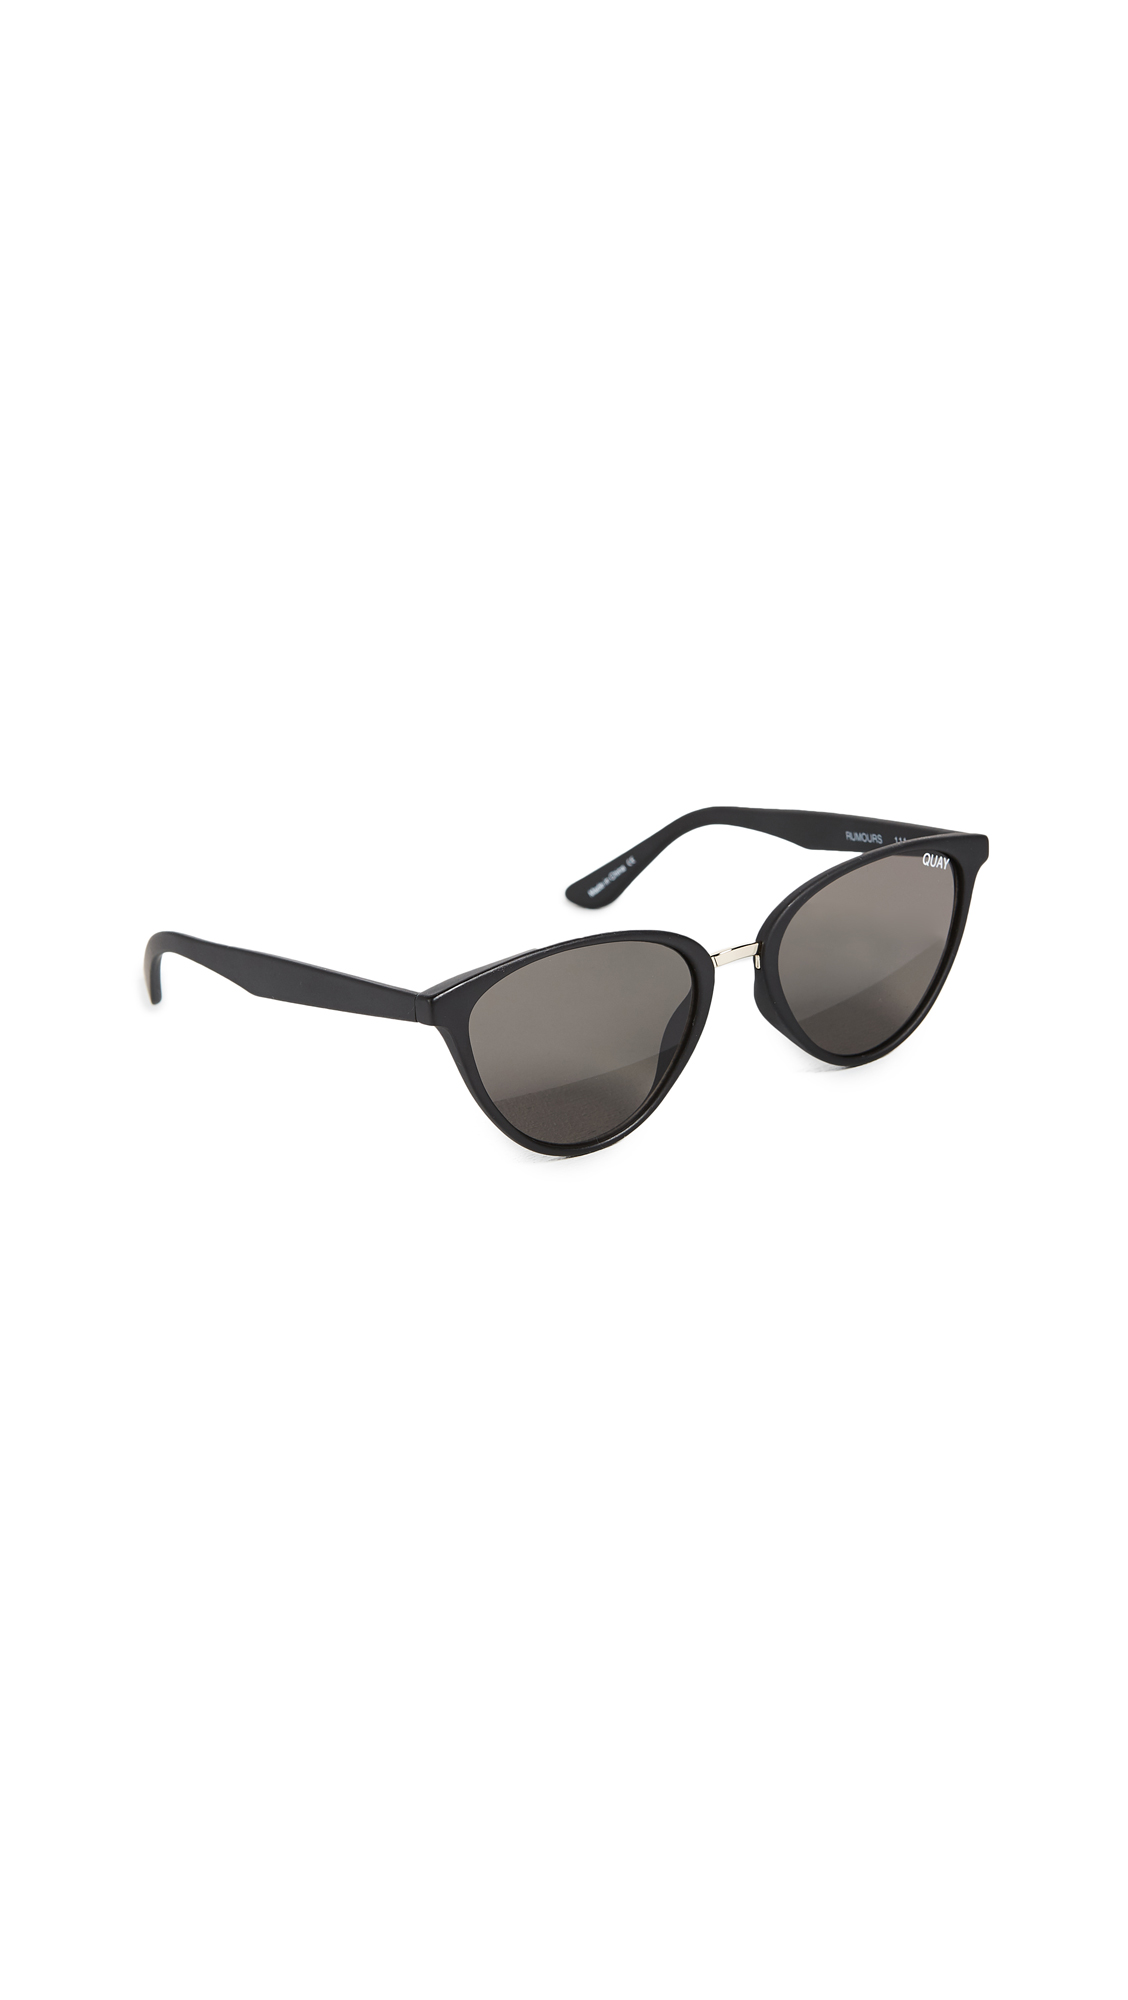 5b87fd09093e5 Quay Rumors Sunglasses